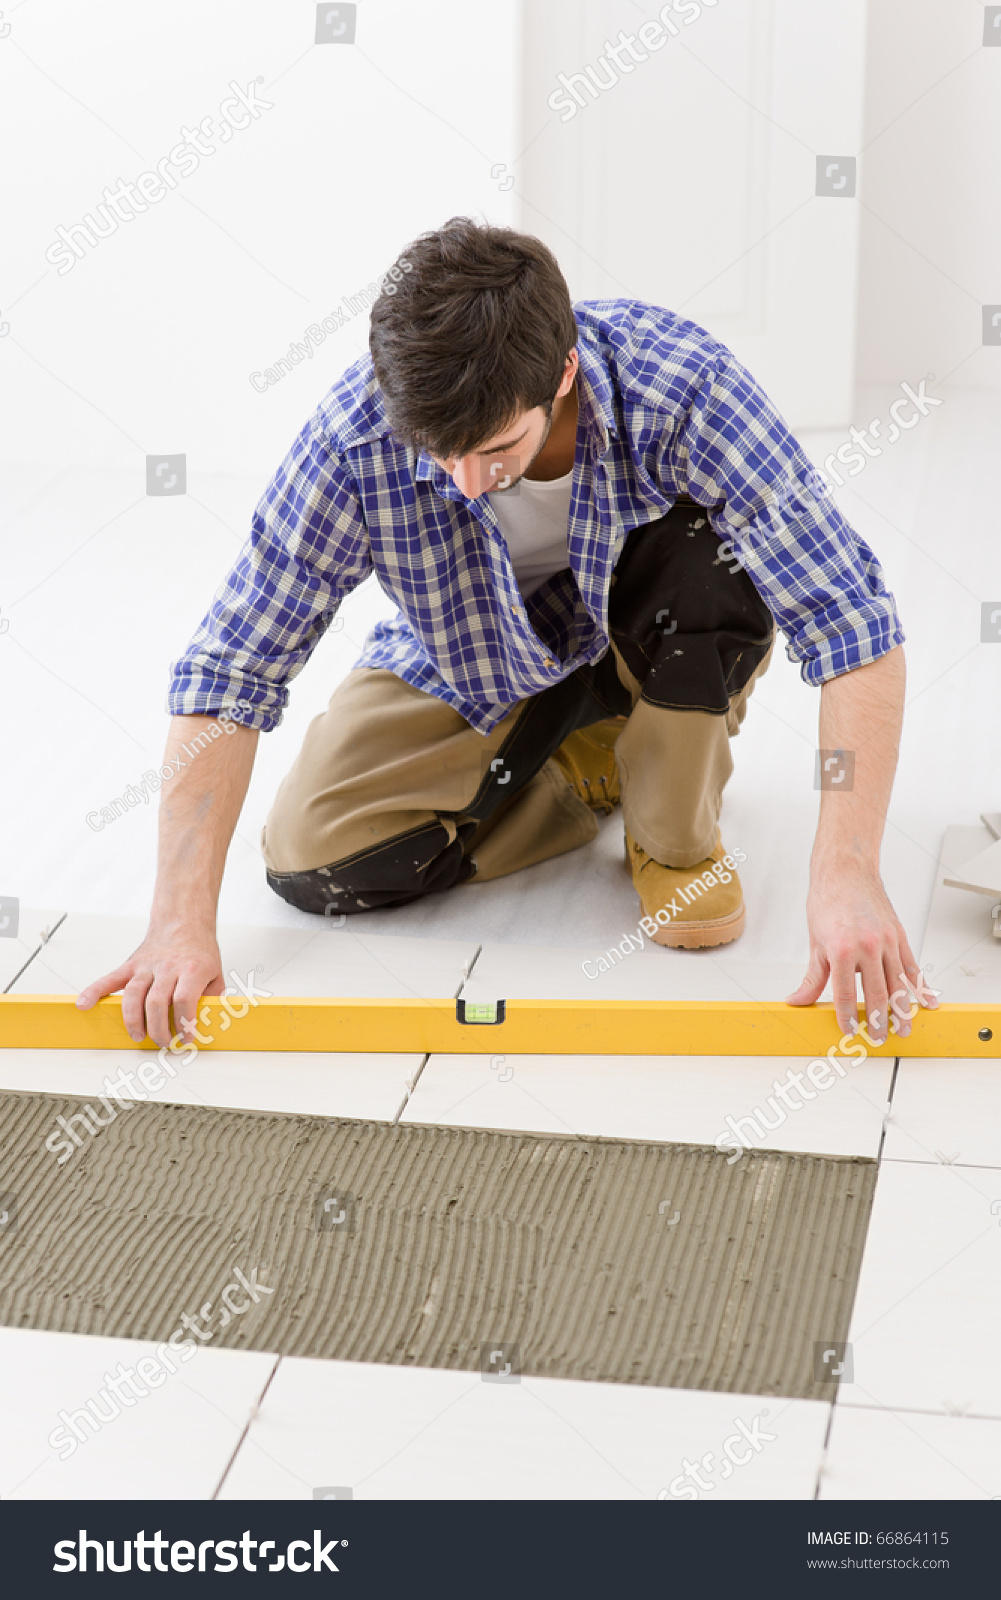 Home Tile Improvement Handyman Level Laying Stock Photo Royalty